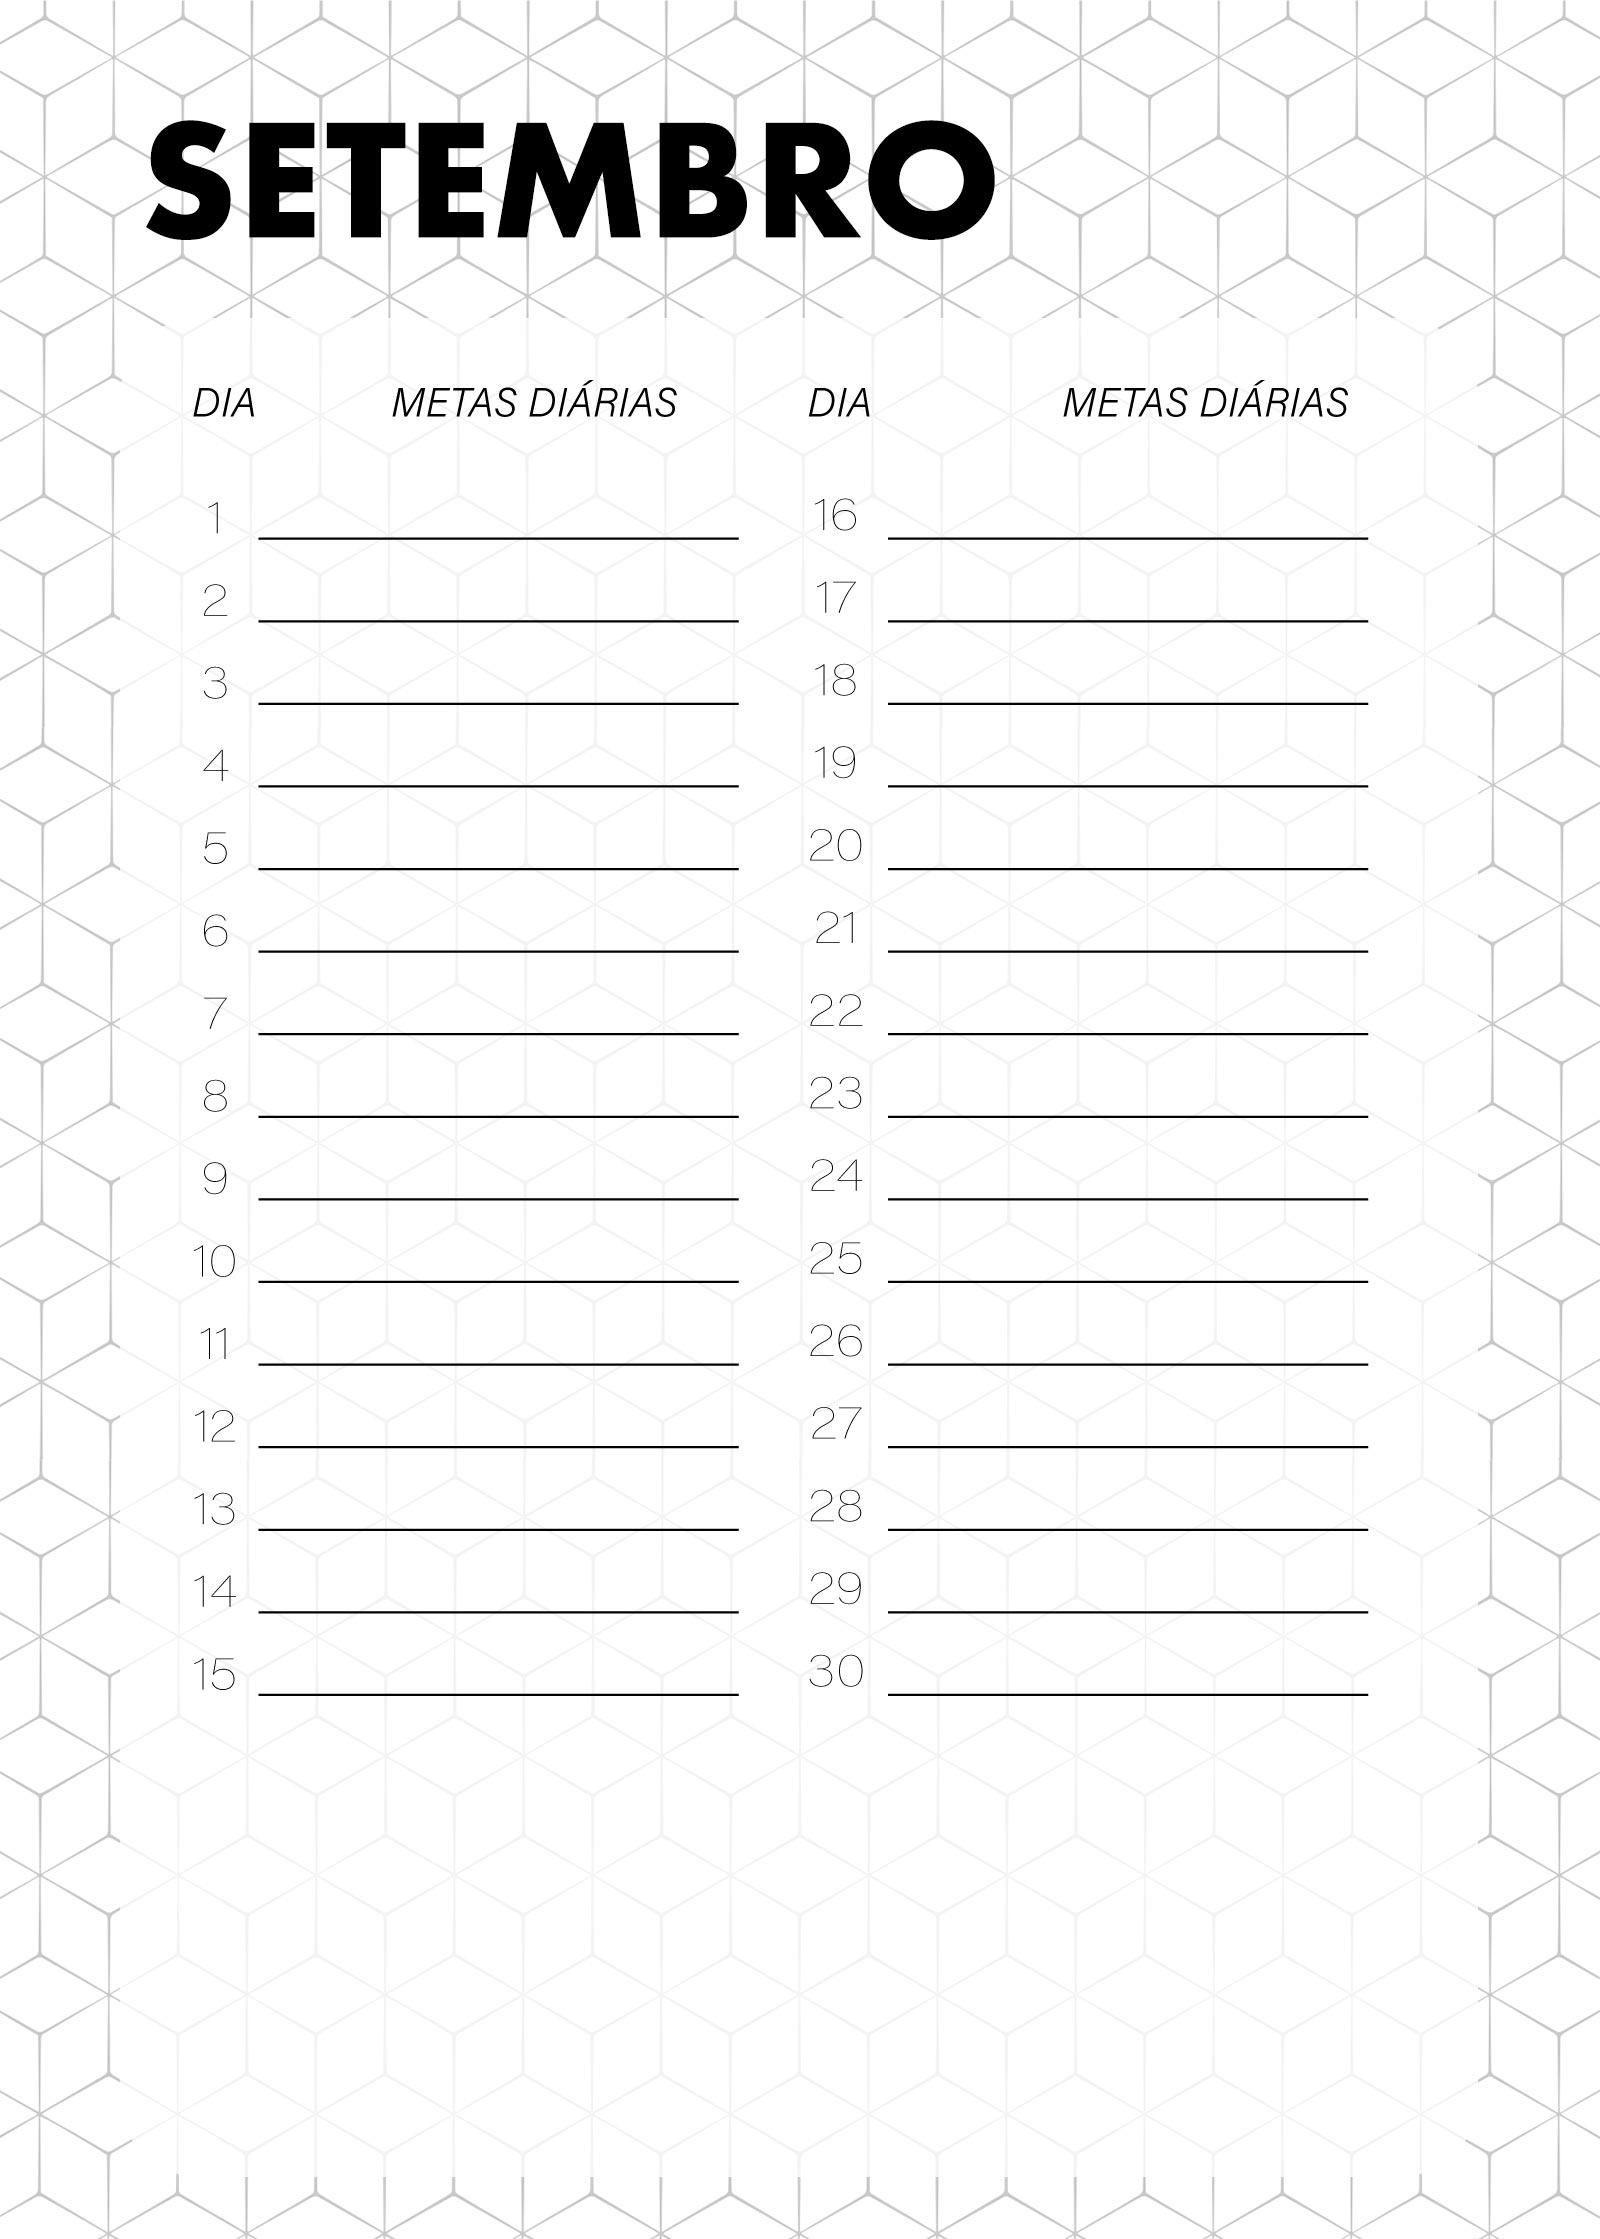 Planner Preto e Branco Metas Diarias Setembro